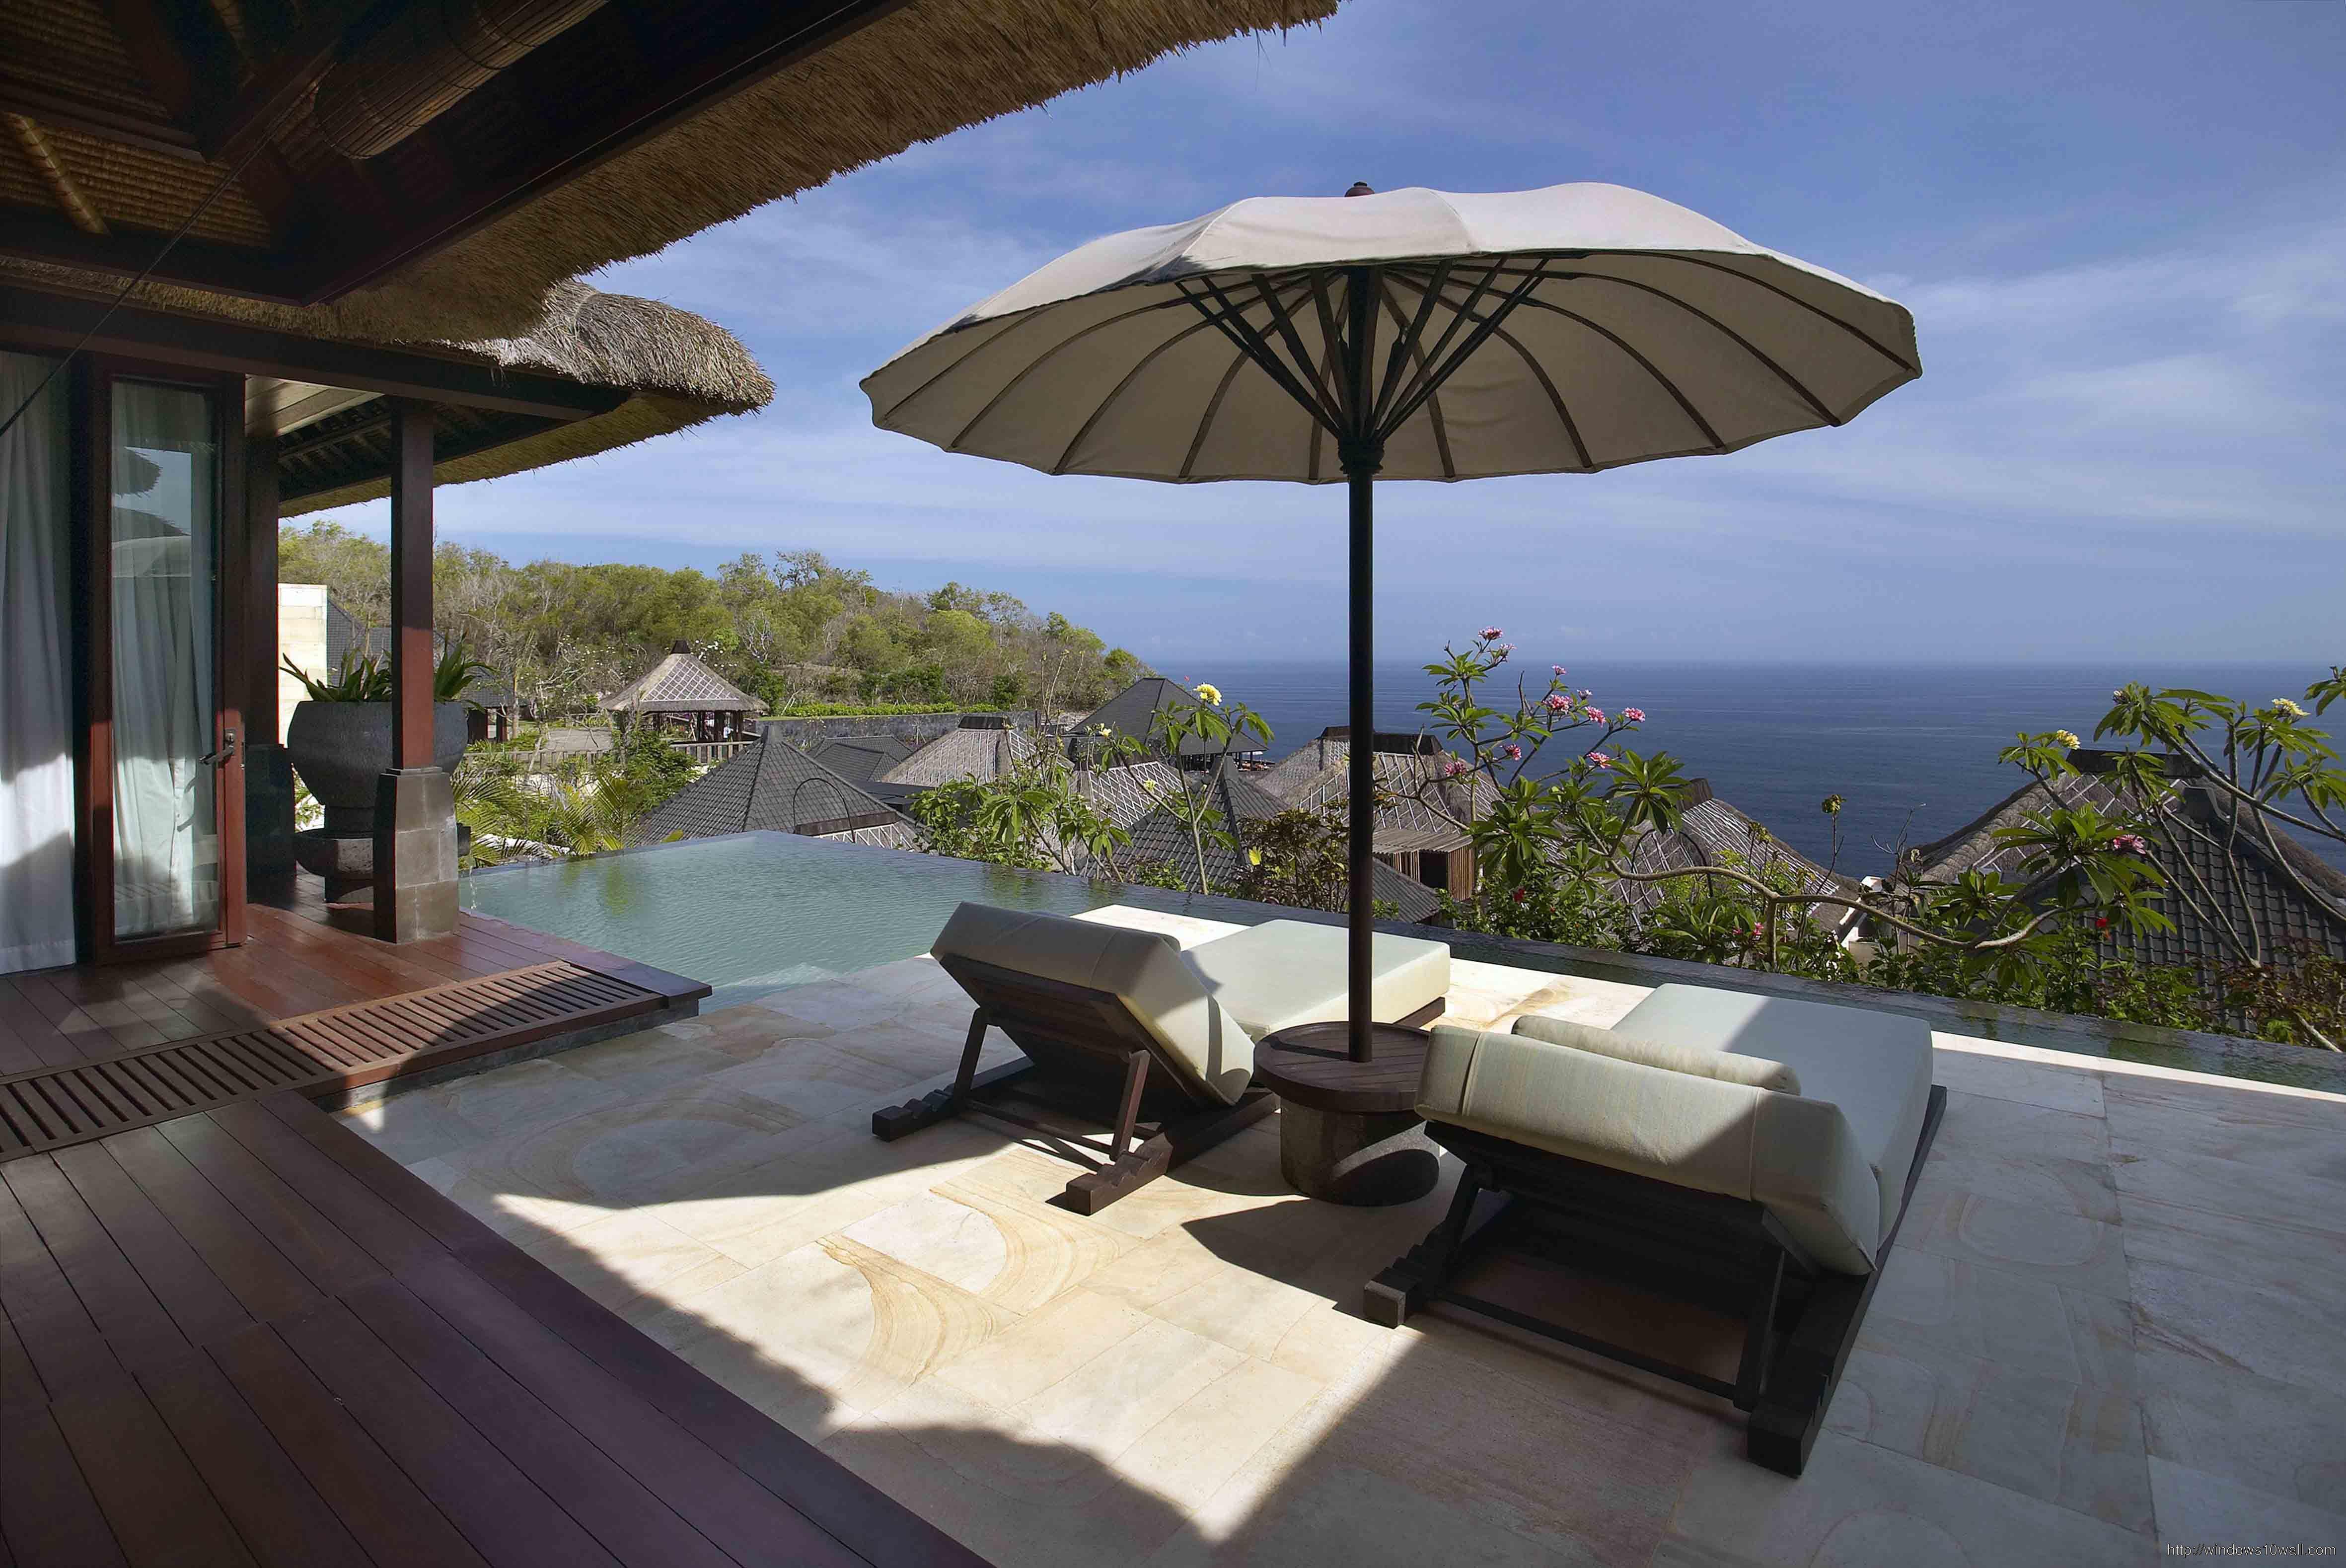 Bali Resorts 5 Star Travel Wallpaper